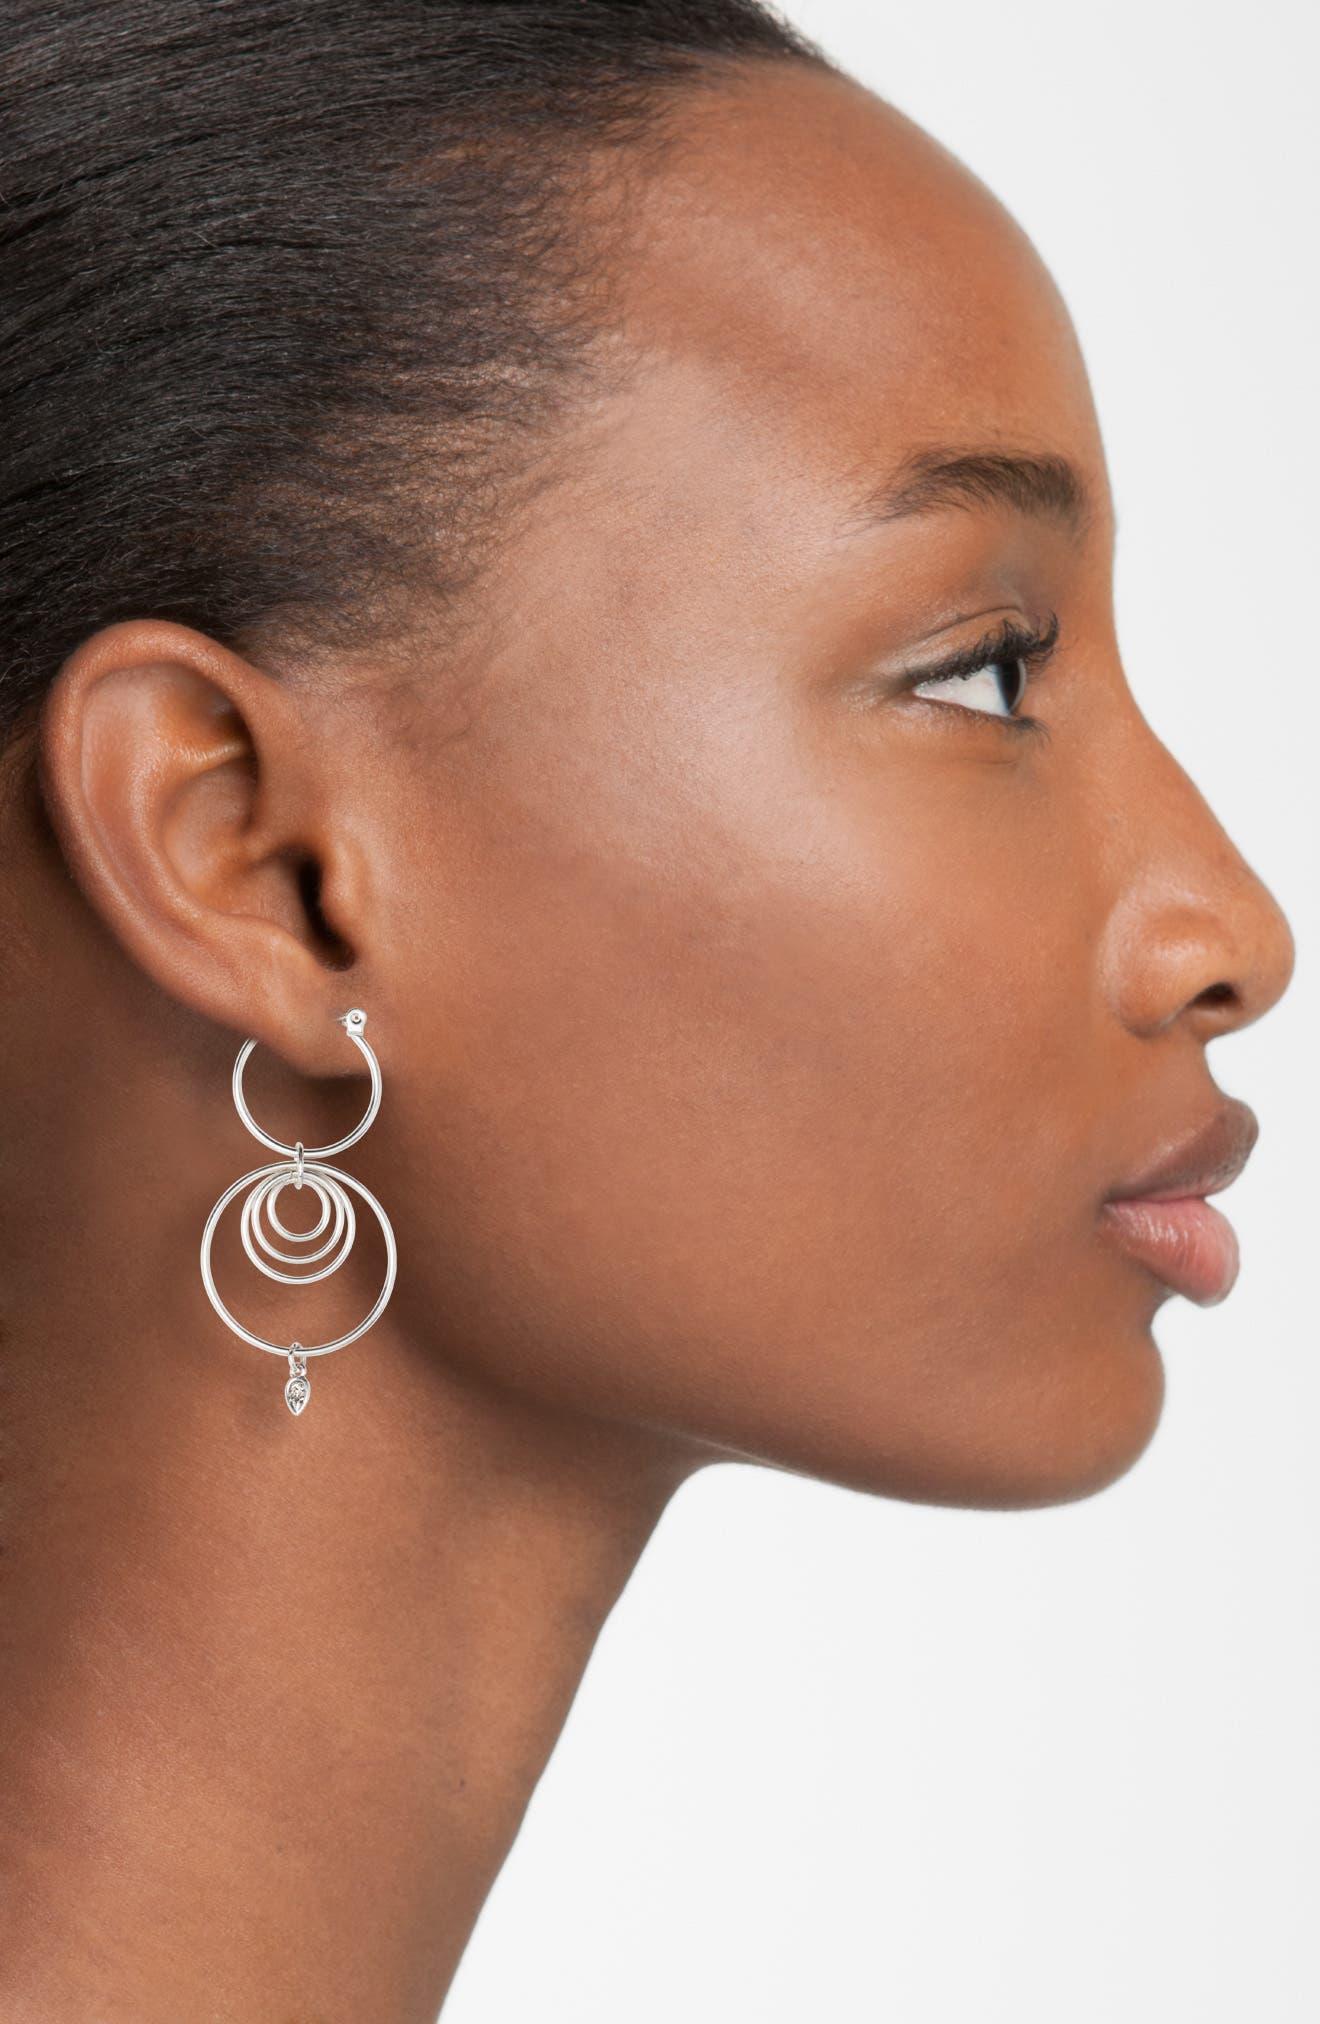 Eclipse Hoop Earrings,                             Alternate thumbnail 2, color,                             040